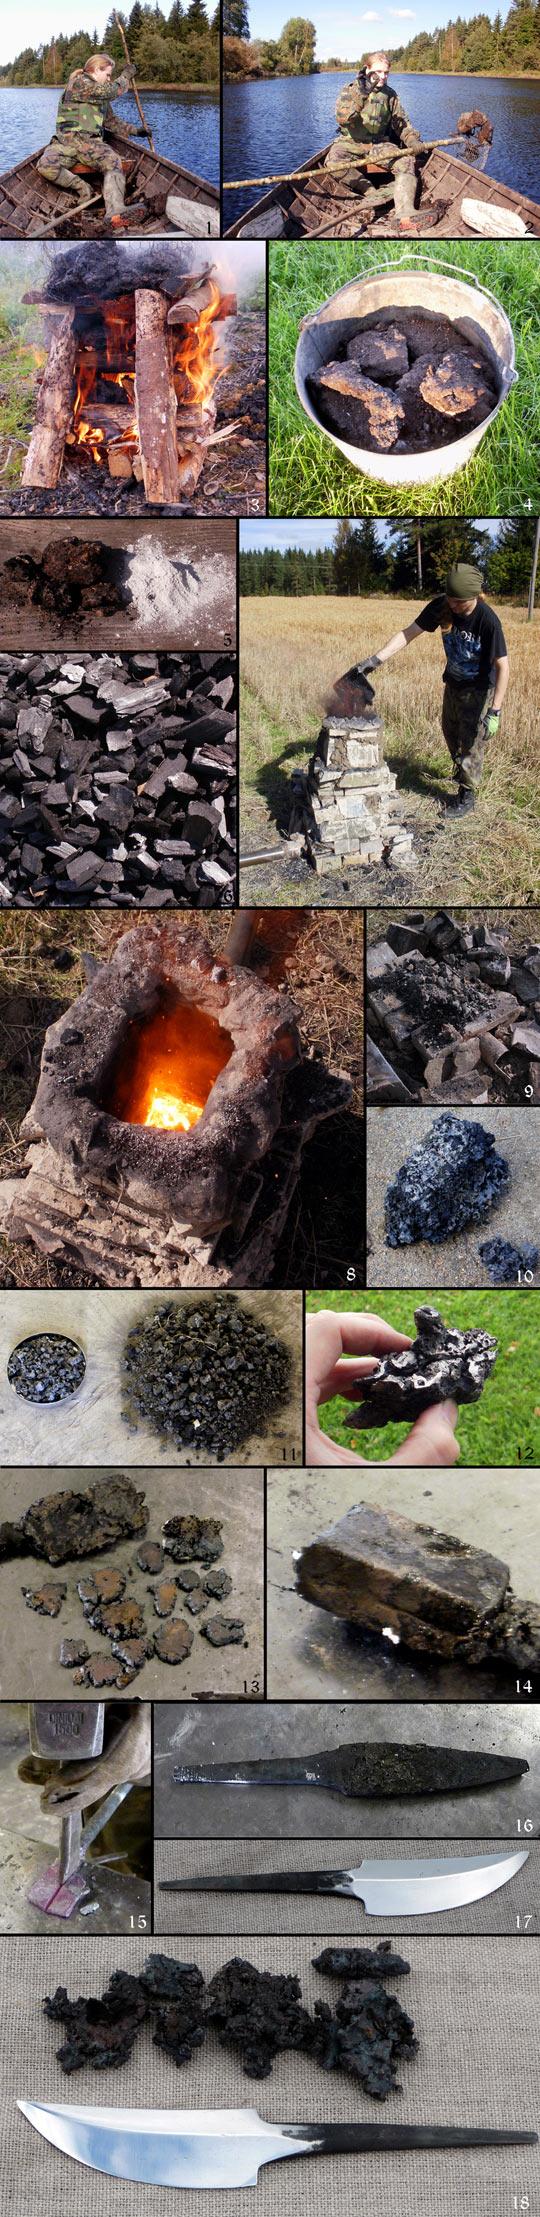 funny-forging-knife-fire-metal-melting